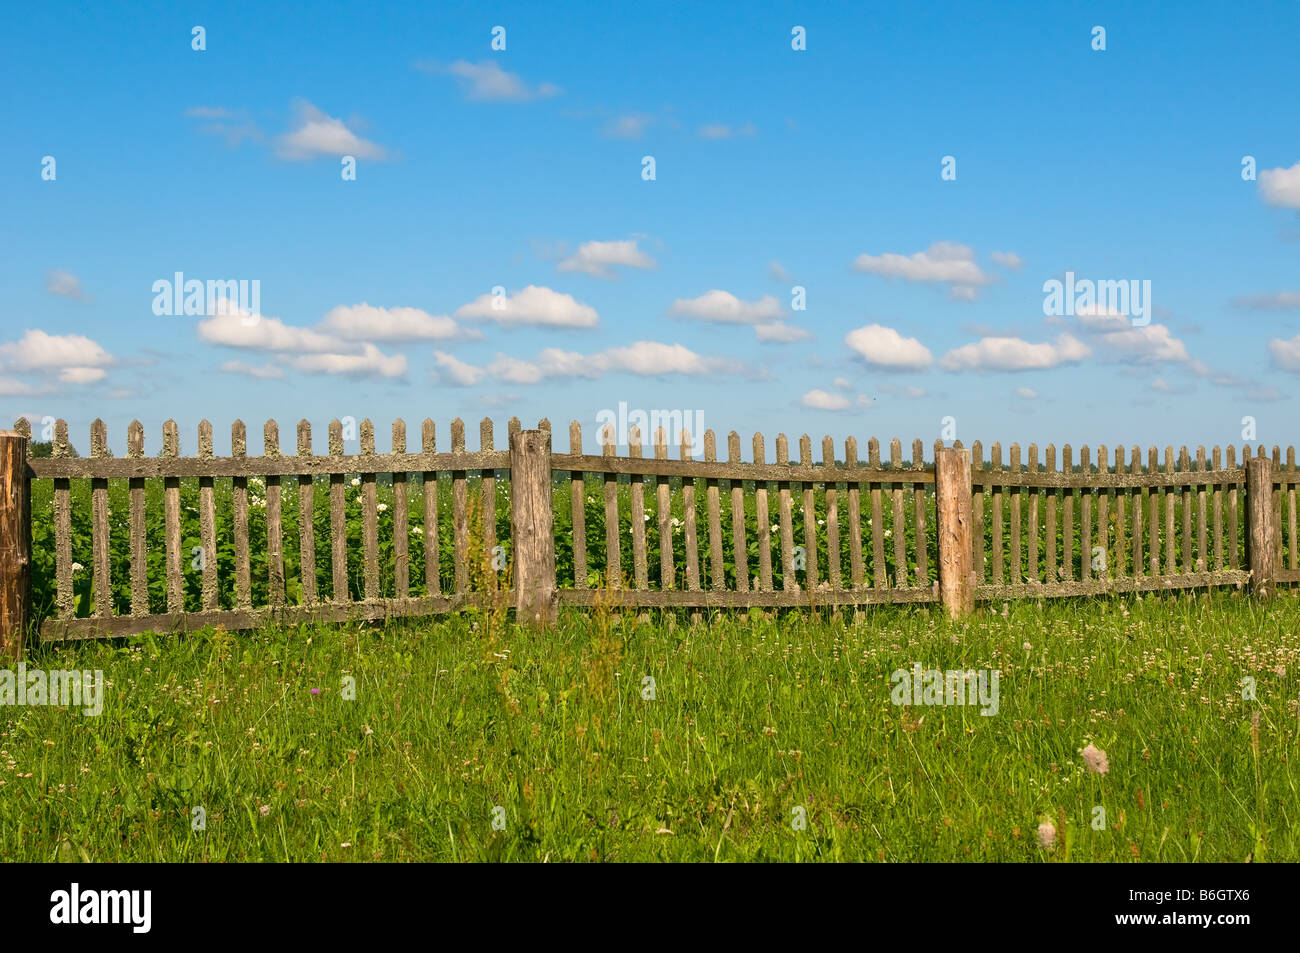 boundary fence stockfotos boundary fence bilder alamy. Black Bedroom Furniture Sets. Home Design Ideas